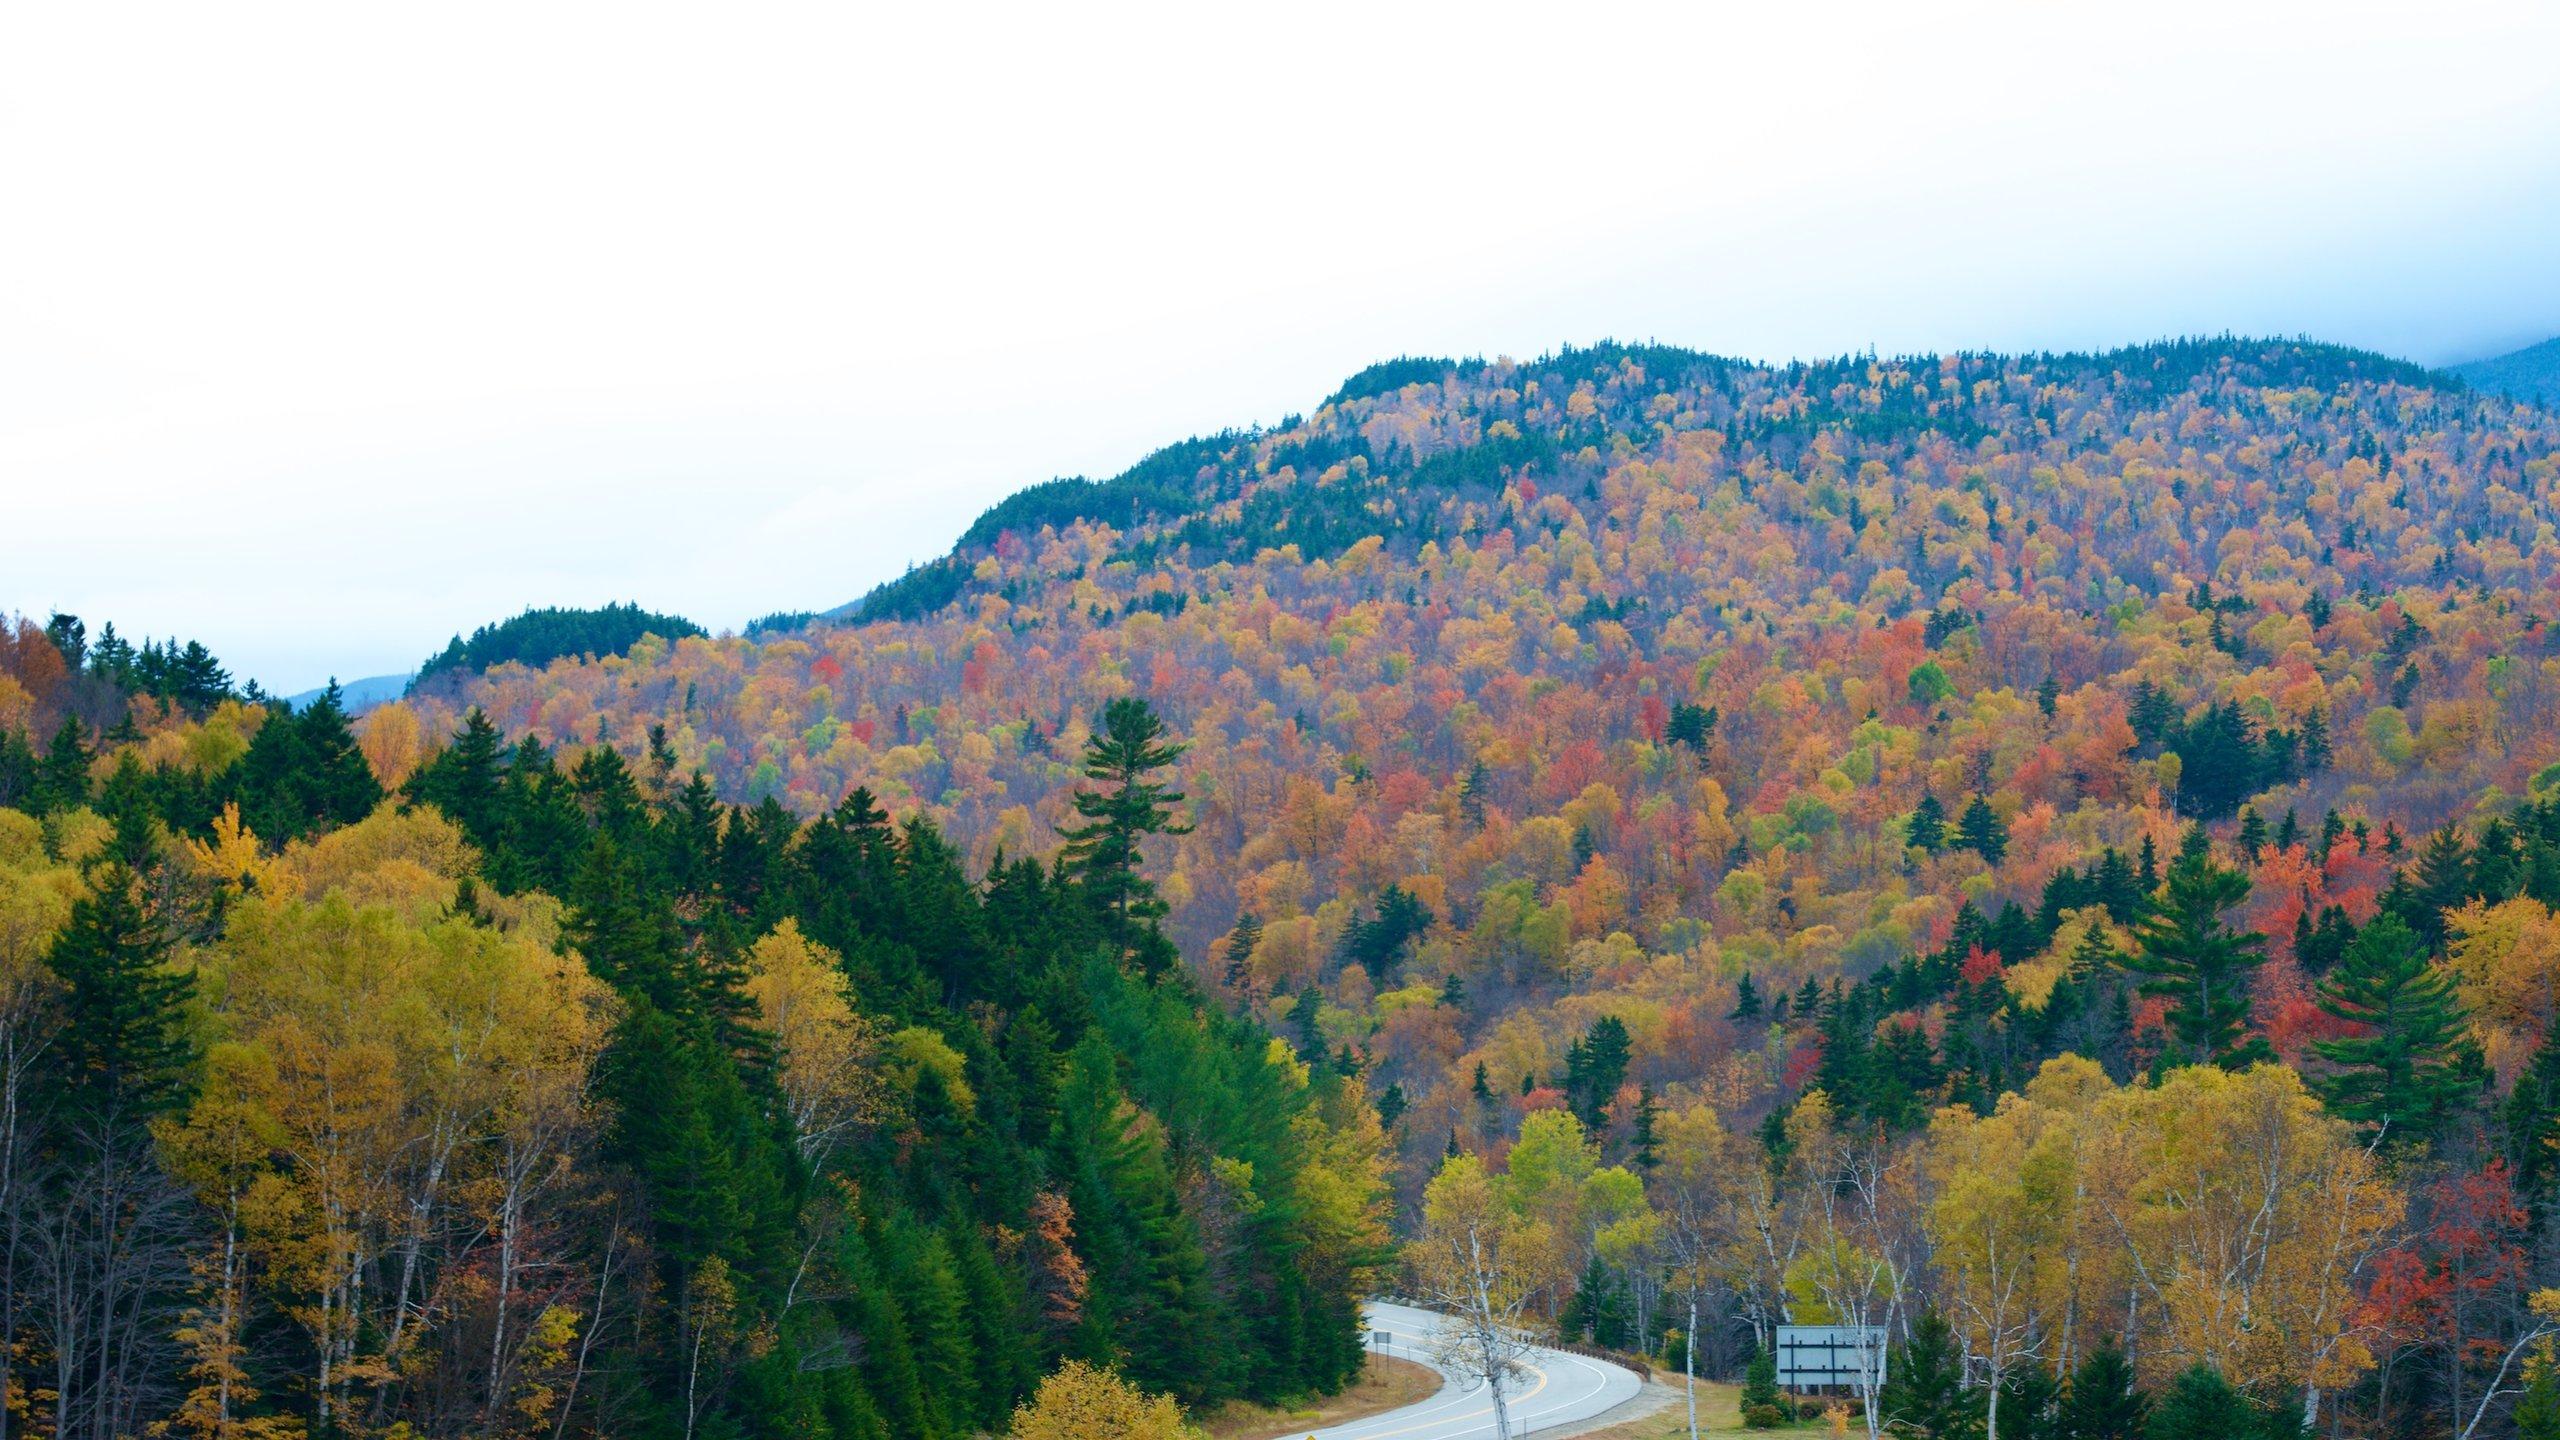 Mount Washington State Park, Randolph, New Hampshire, United States of America